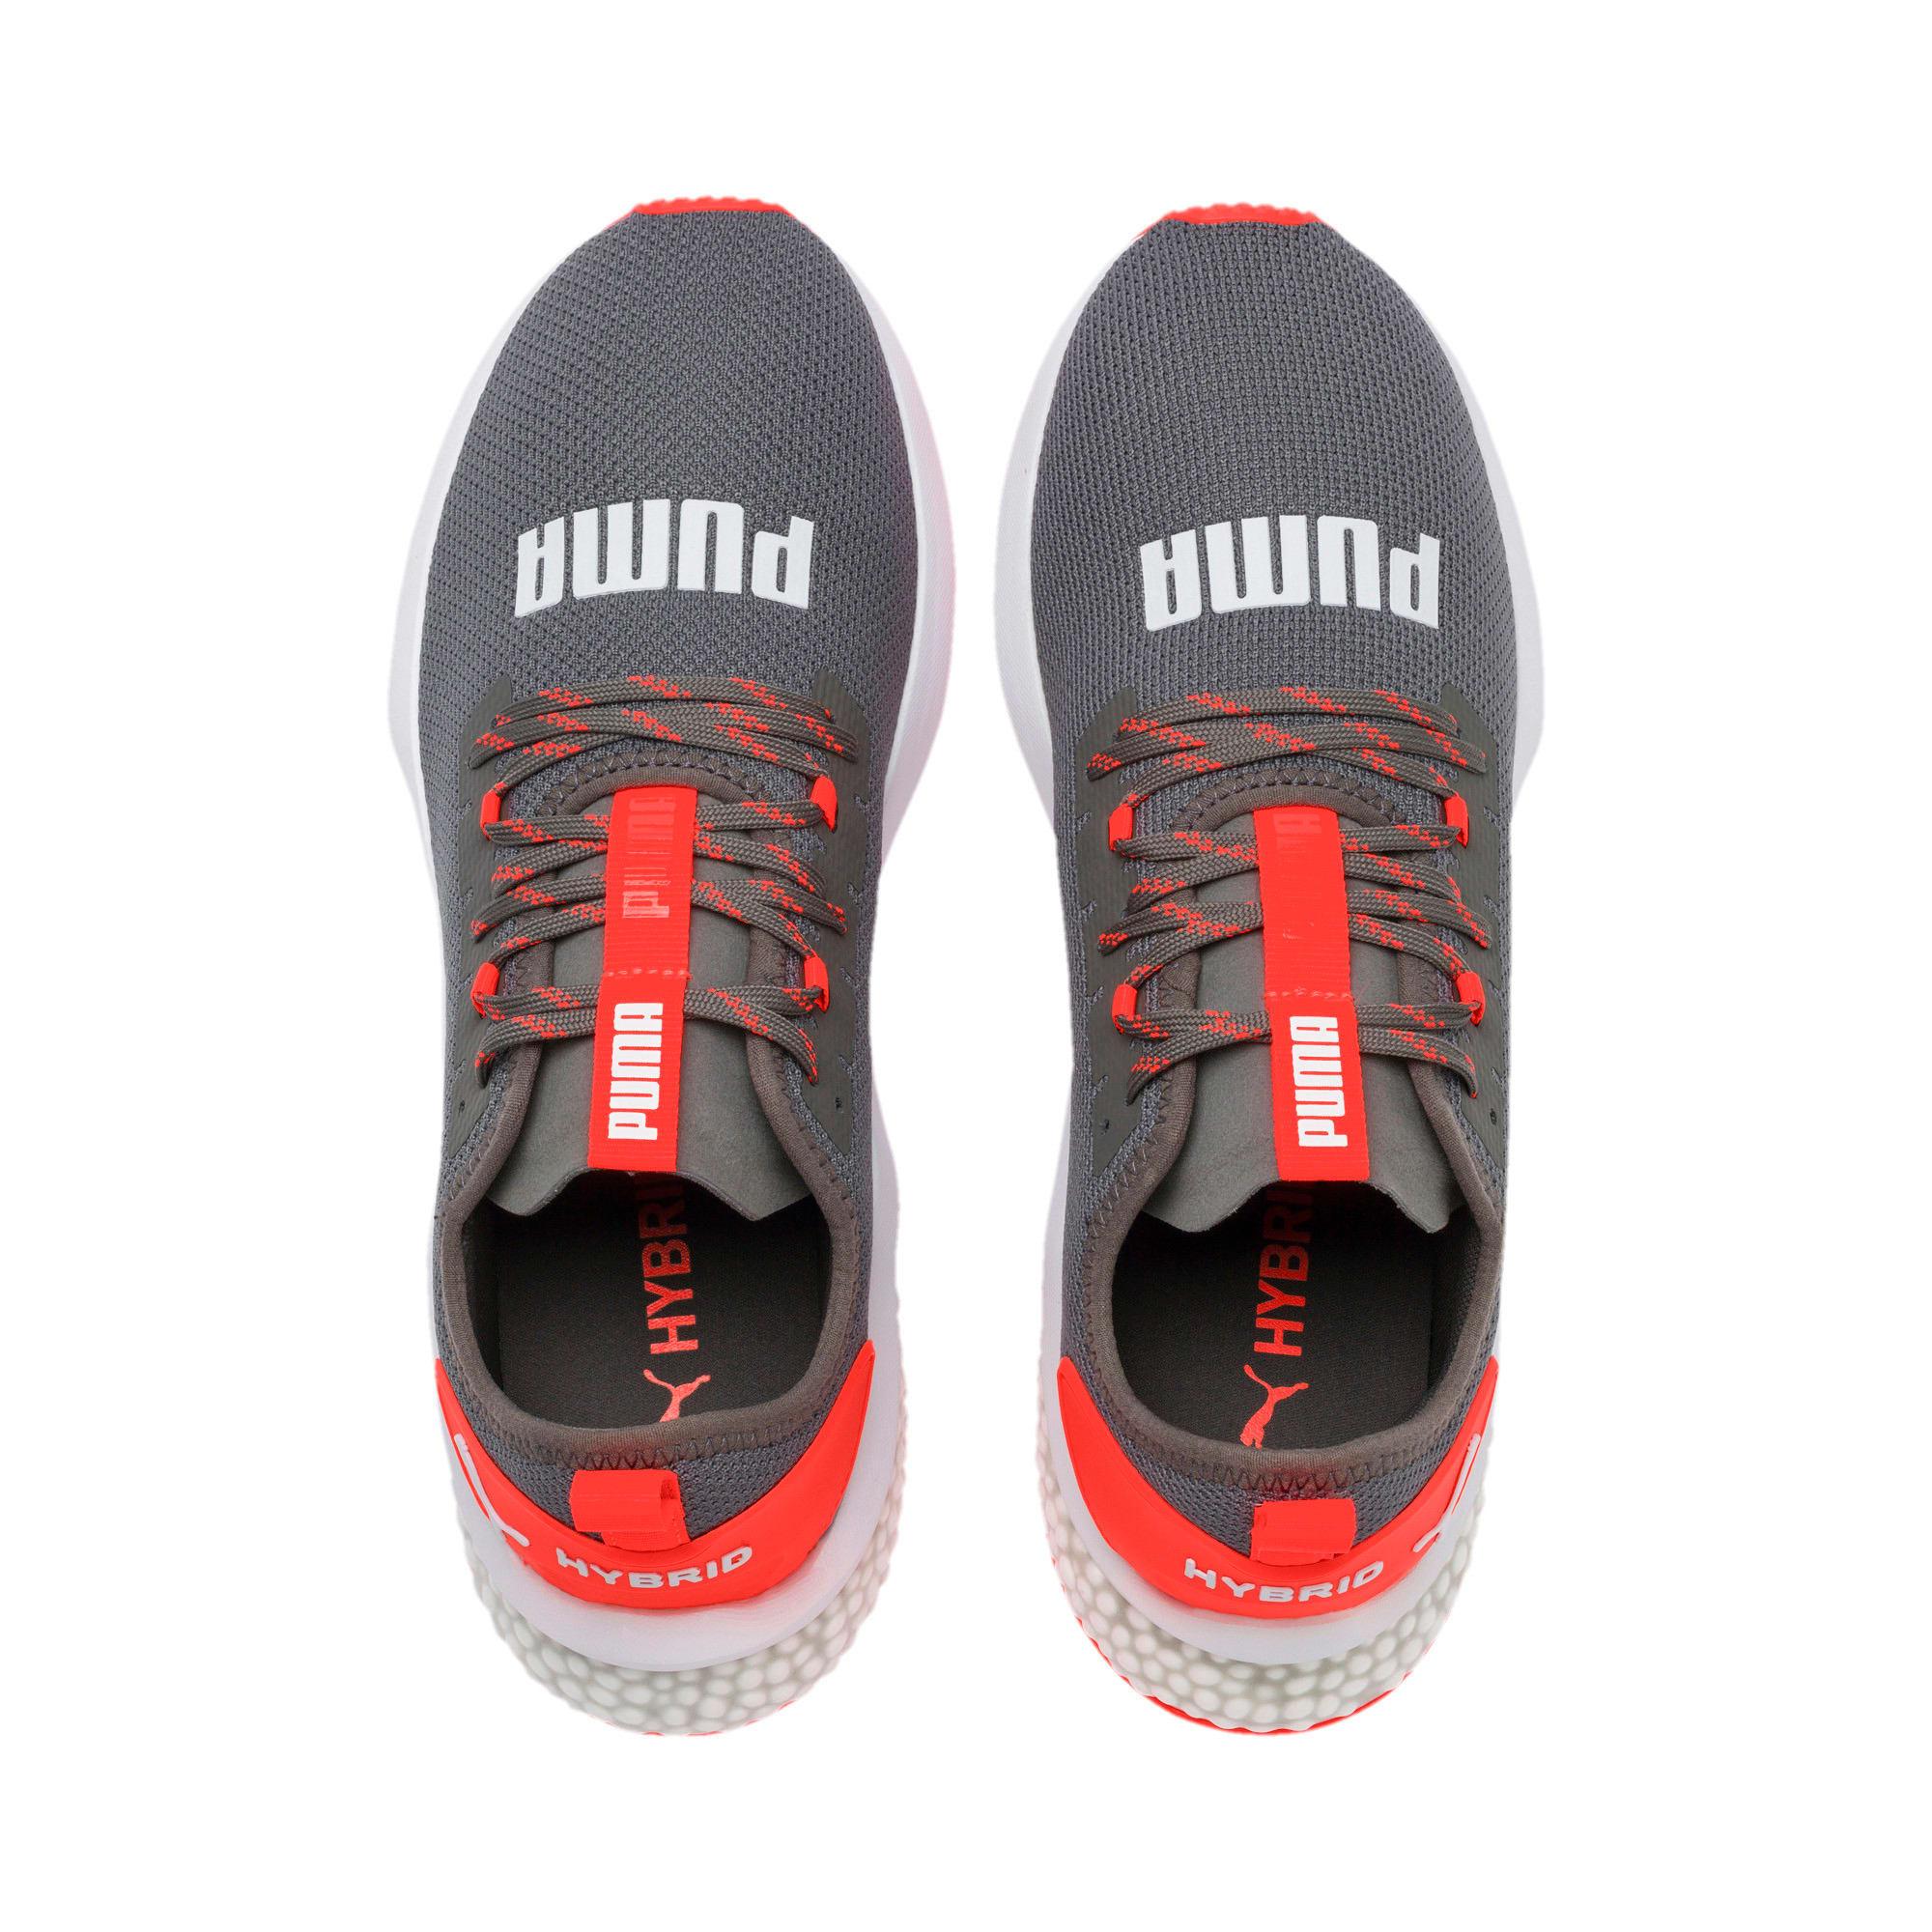 Thumbnail 7 of HYBRID NX Men's Running Shoes, CASTLEROCK-Nrgy Red, medium